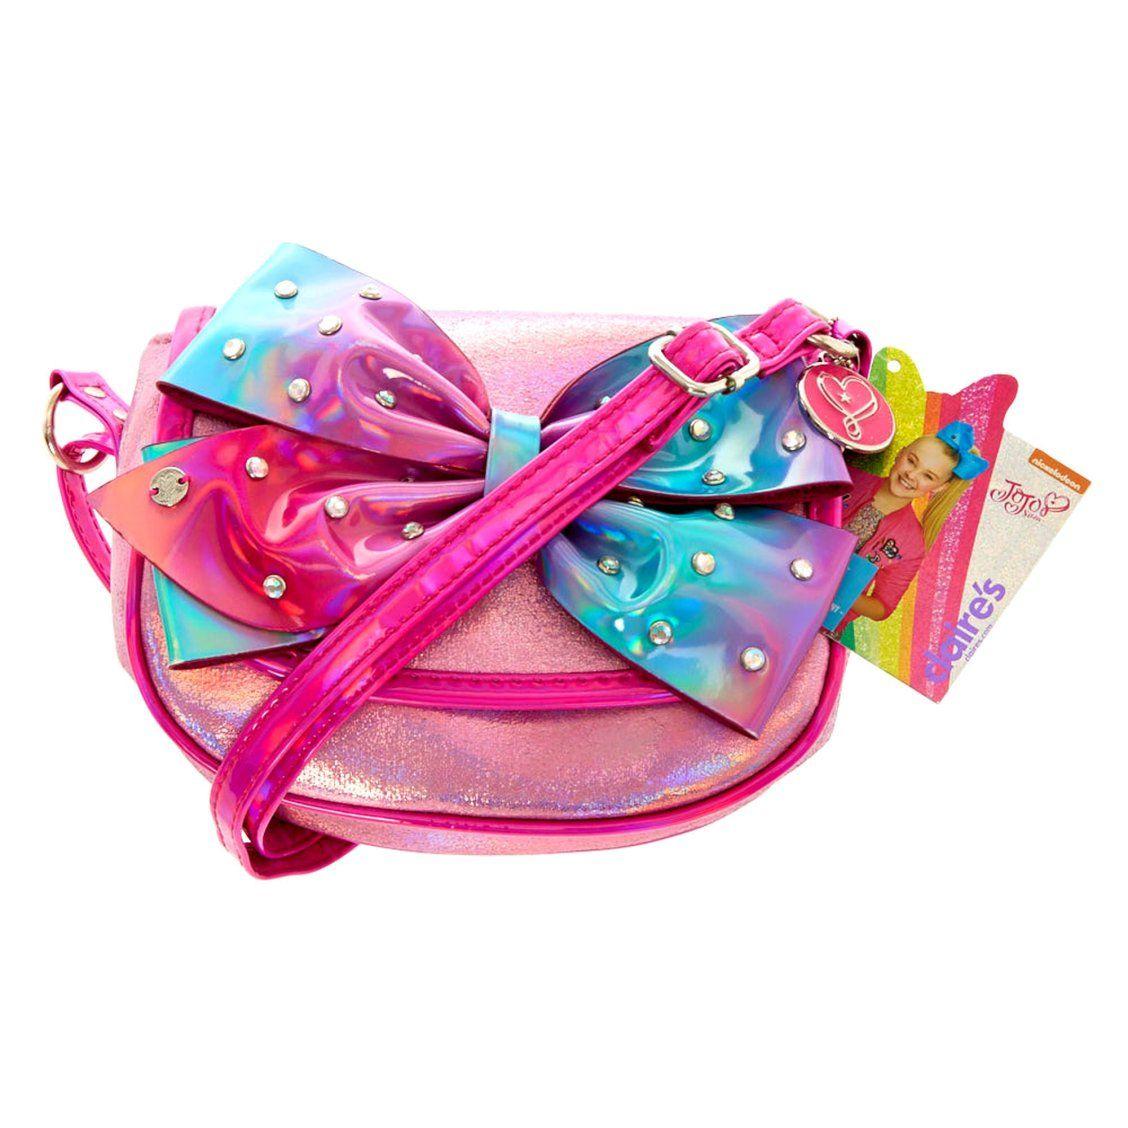 110b407d7a43 JoJo Siwa Holographic Crossbody Bag